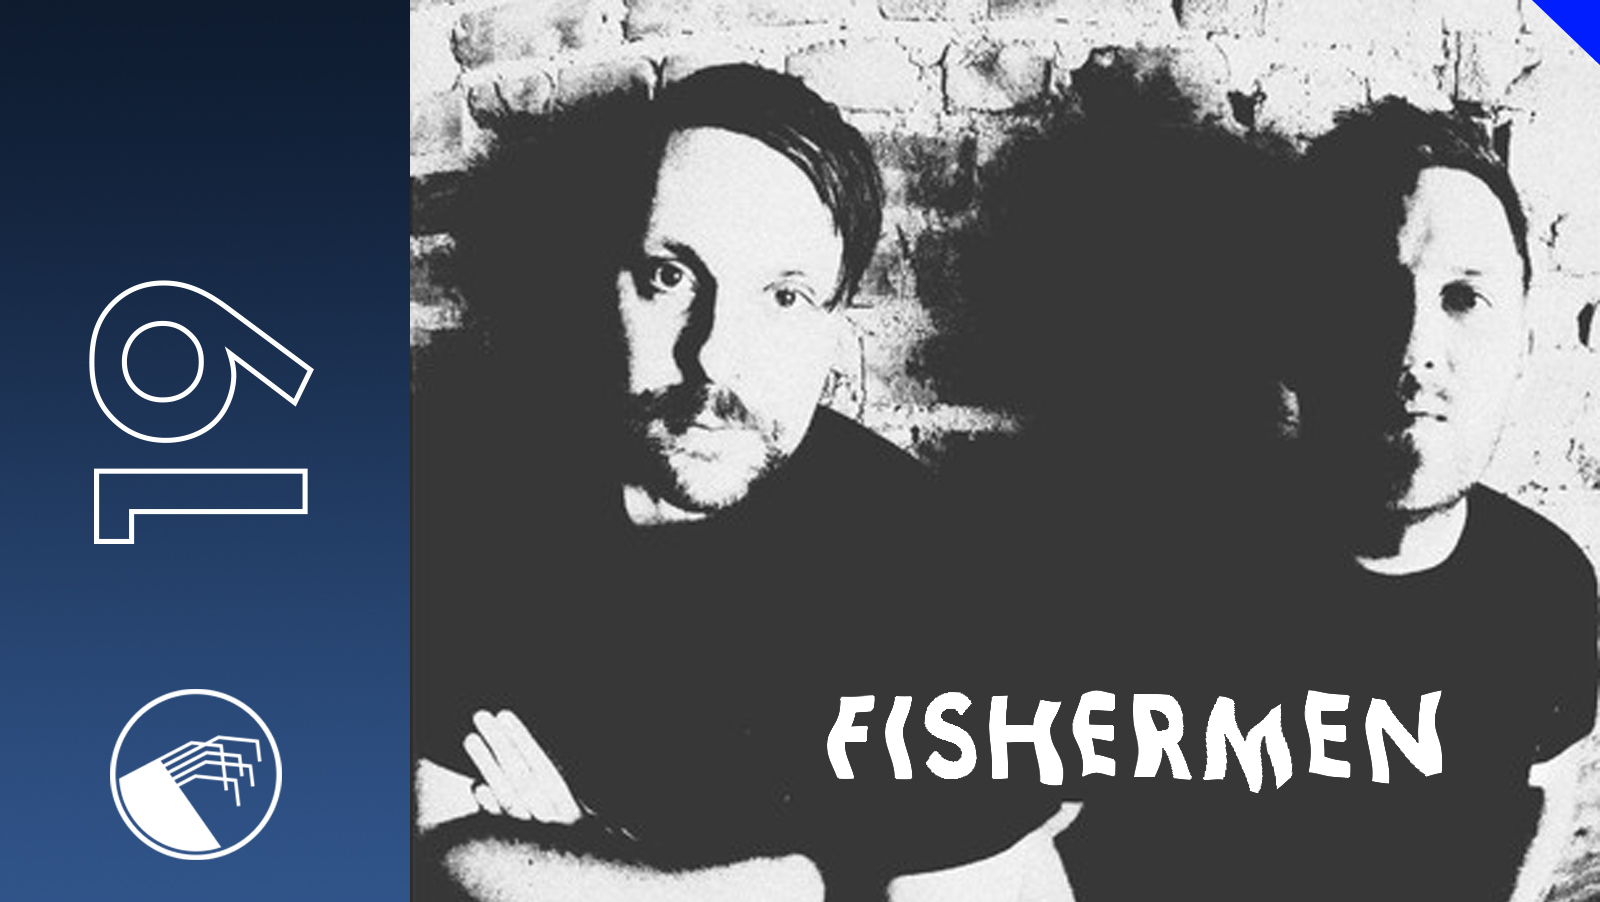 019 Fishermen